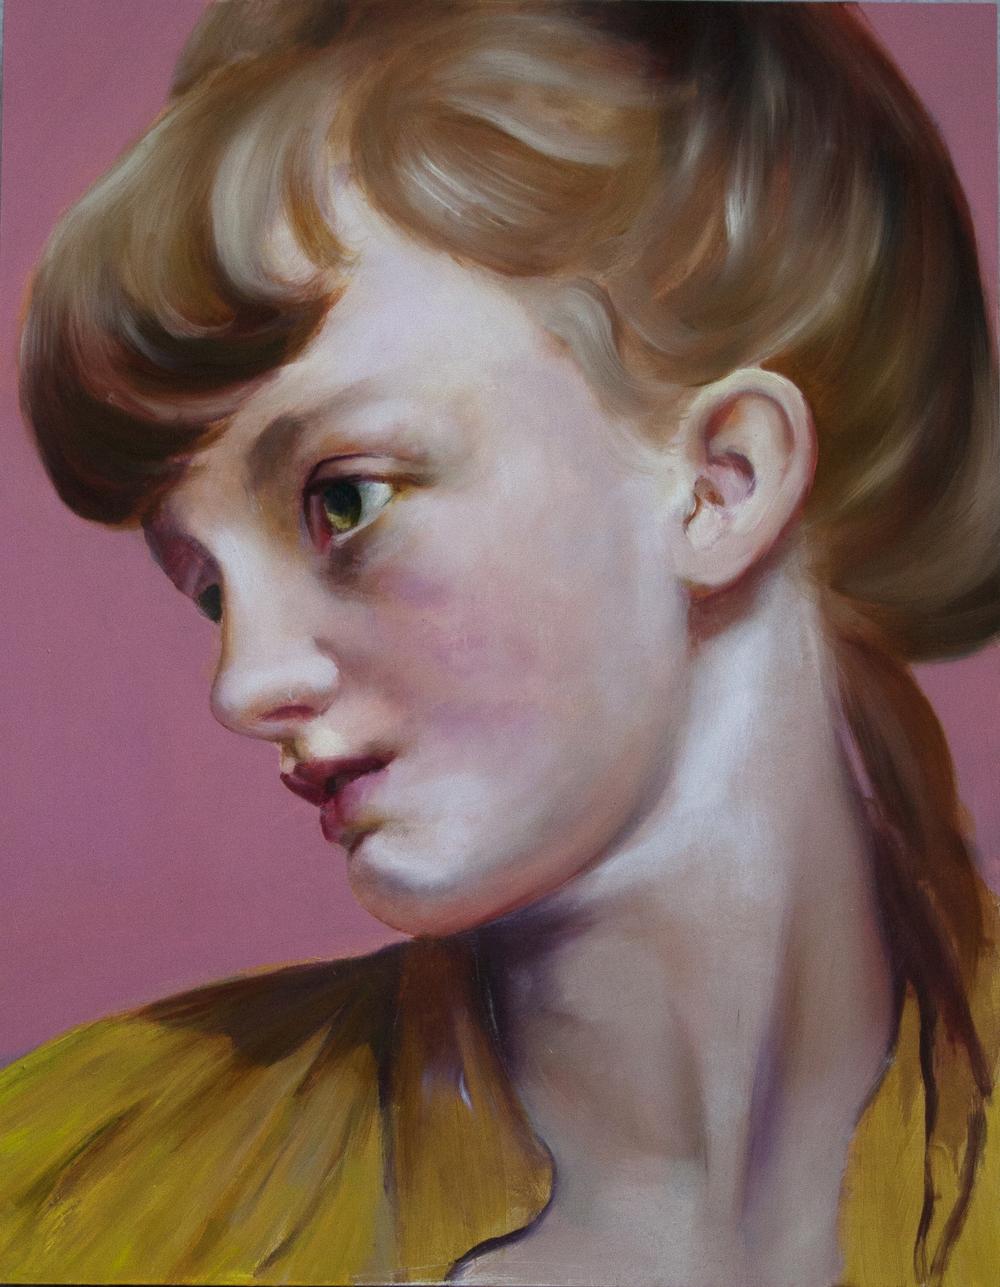 "stillness steps,oil on canvas over panel, 14"" x 11"", 2015."